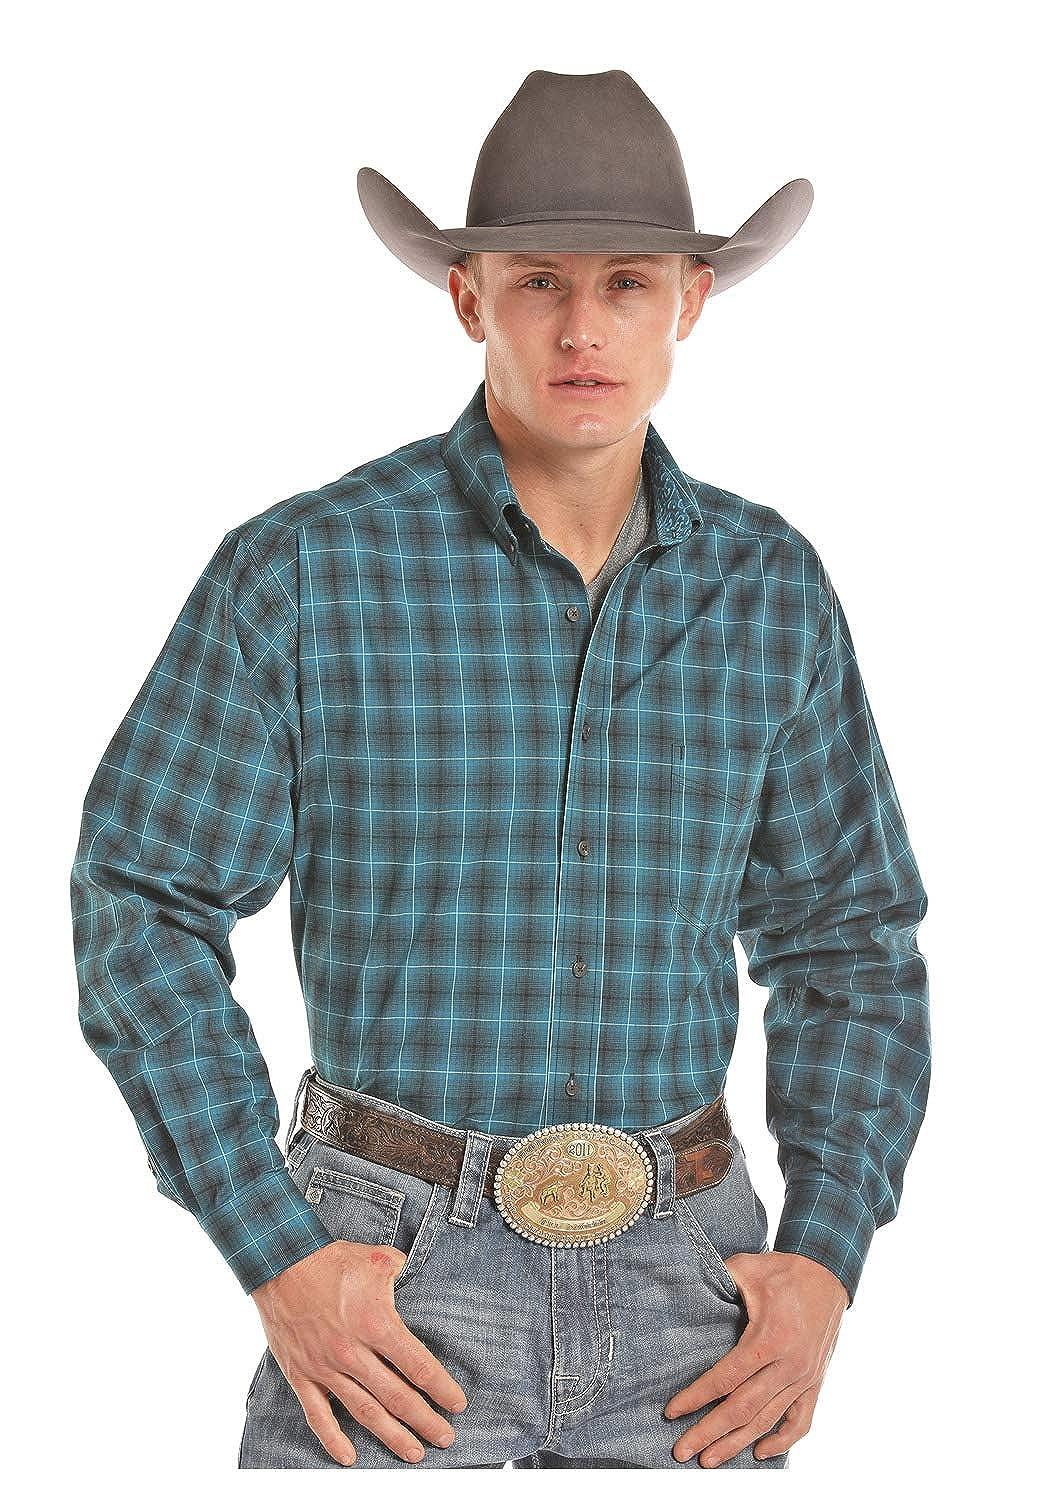 2a7aadcc7 Panhandle Men's Tuf Cooper Button-up Long Sleeve Shirt - TCD7216 ...